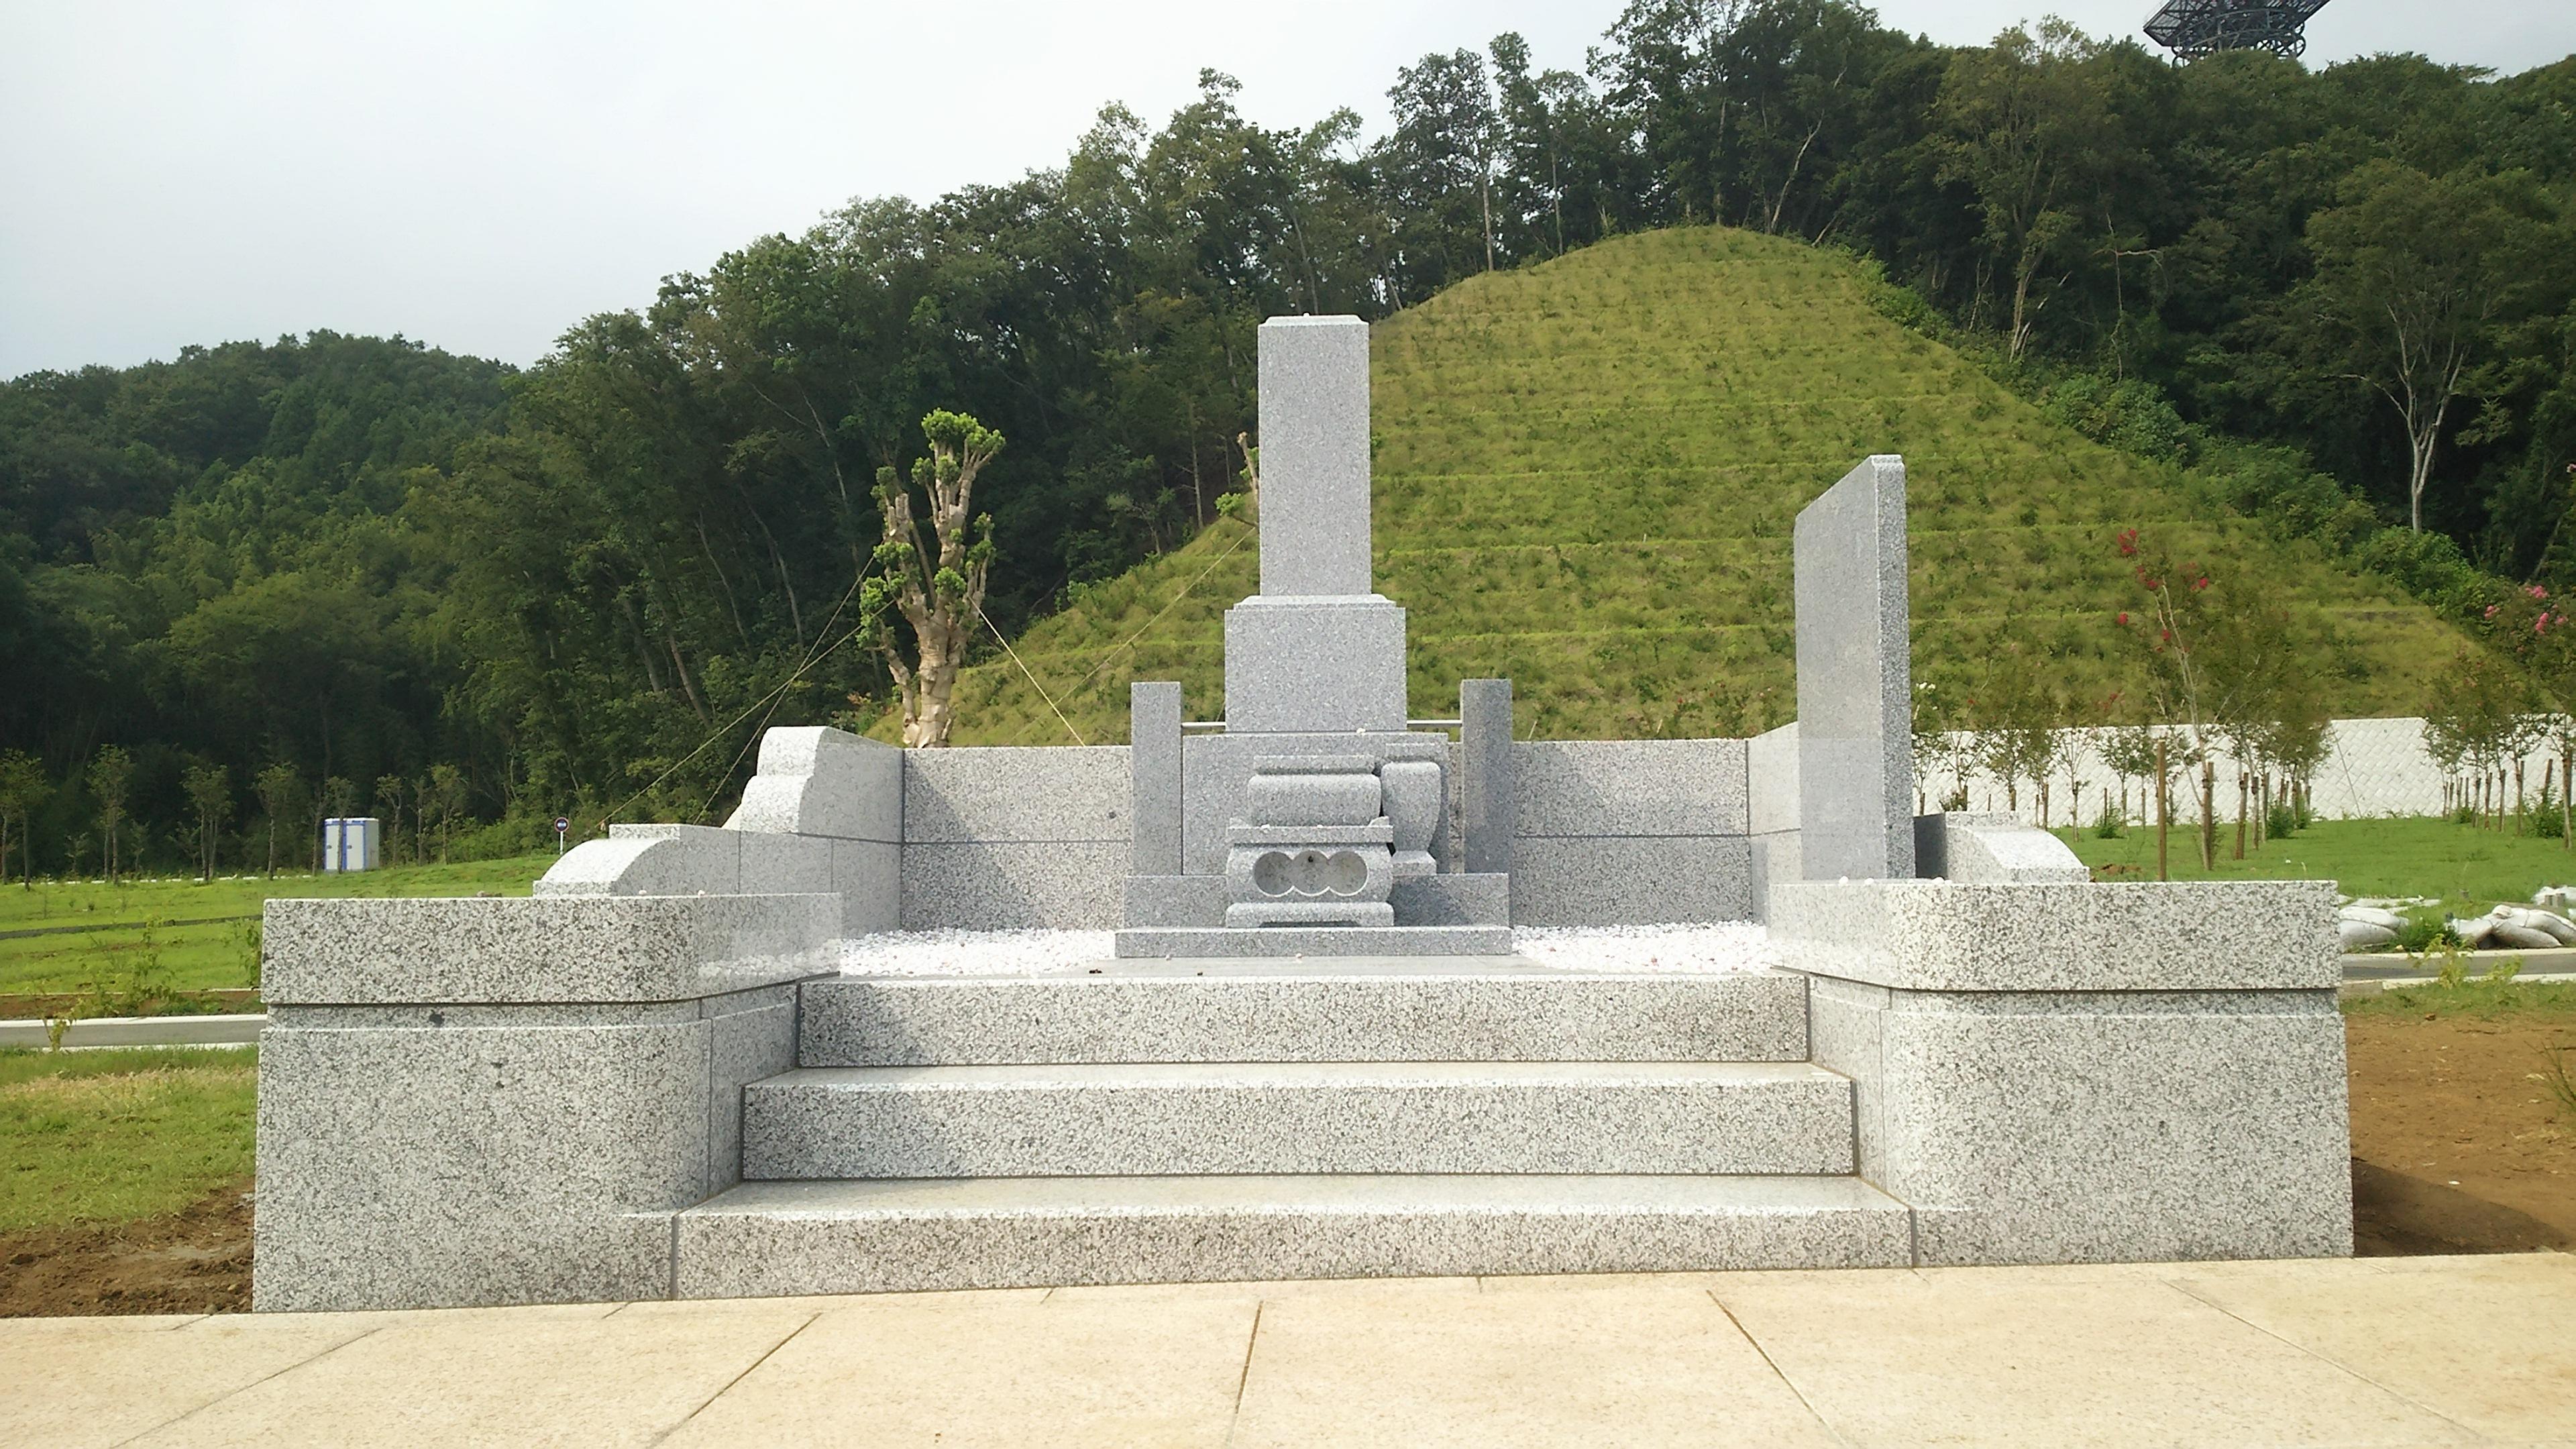 http://www.shonan-ls.co.jp/blog/stone/img/DSC_3346.JPG